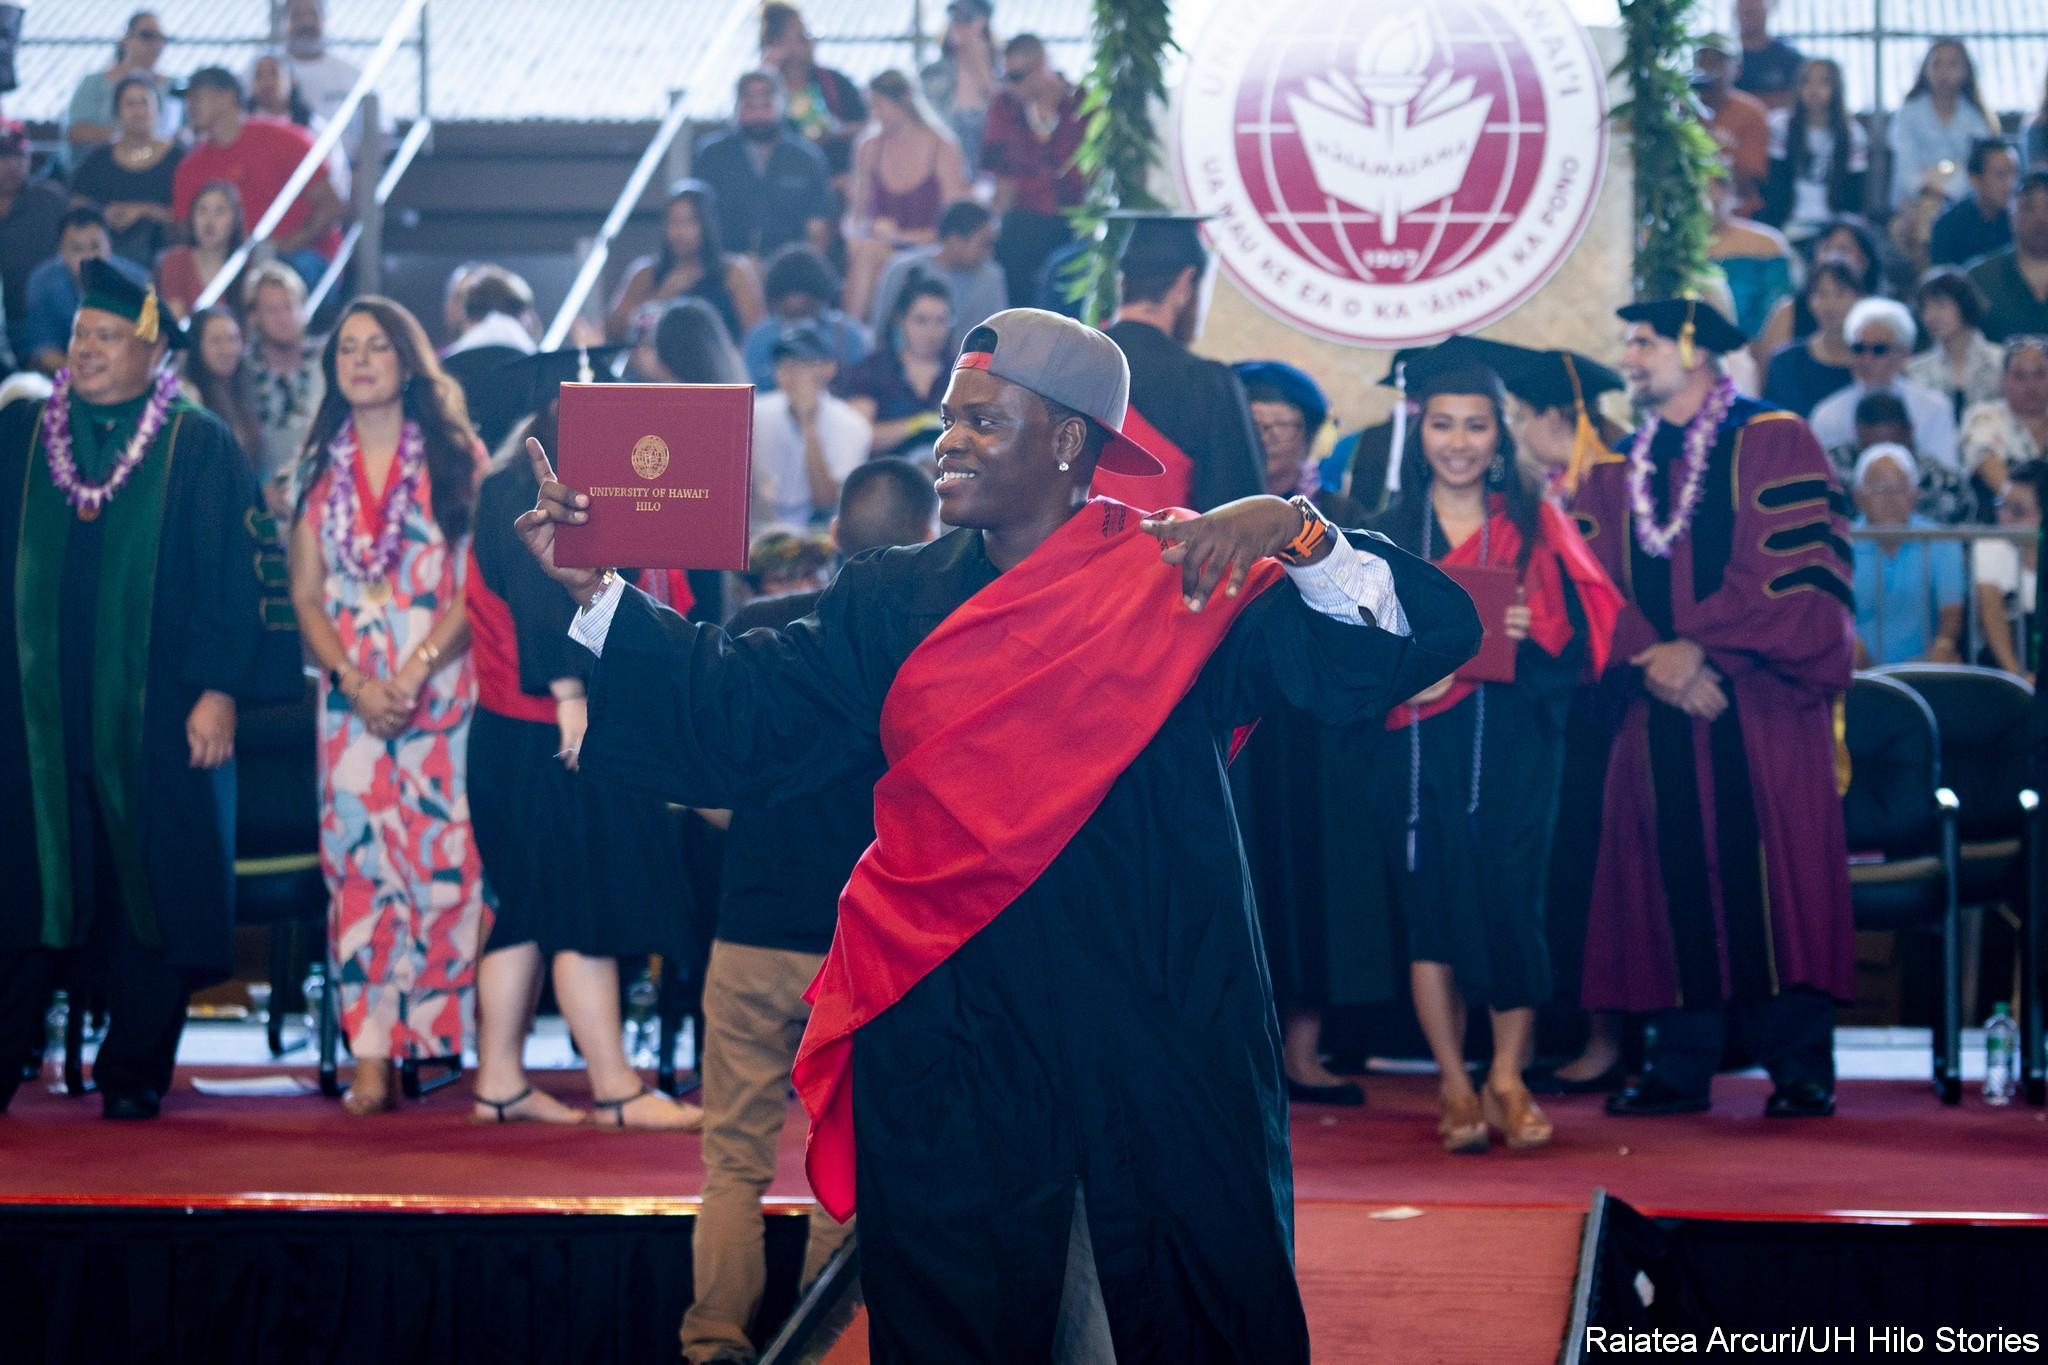 Male graduate with backward baseball cap leaving dais with diploma.